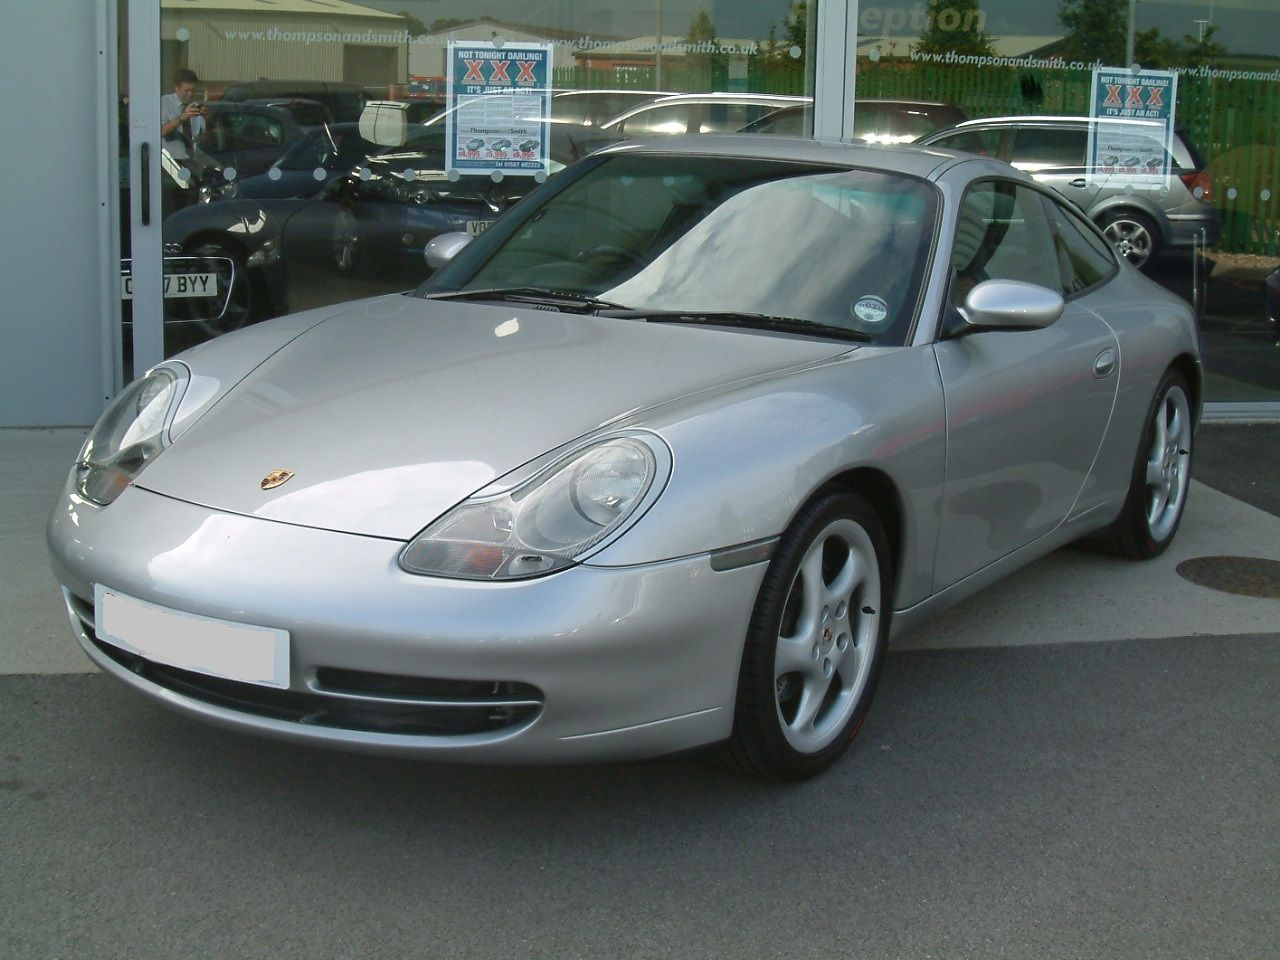 1999 Porsche Carrera 4s At Wwwwoldsideclassicscouk